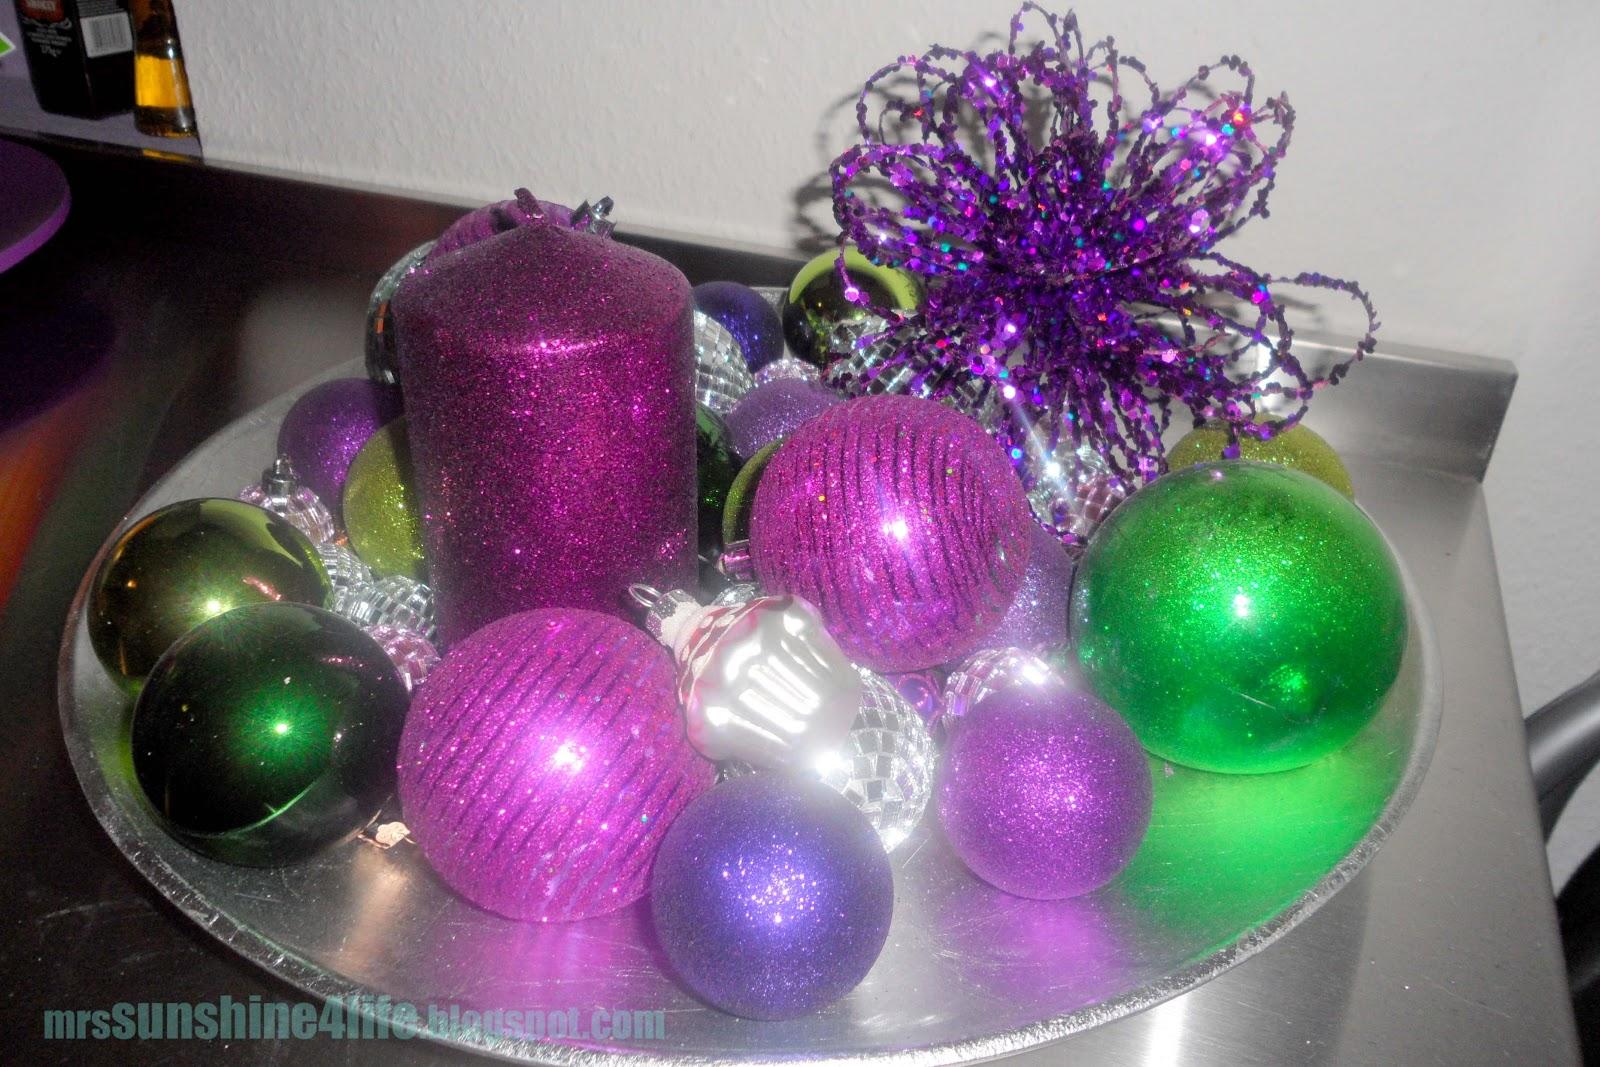 Sunshine4life eyecandy last christmas part 4 - Nanu nana weihnachtsdeko ...